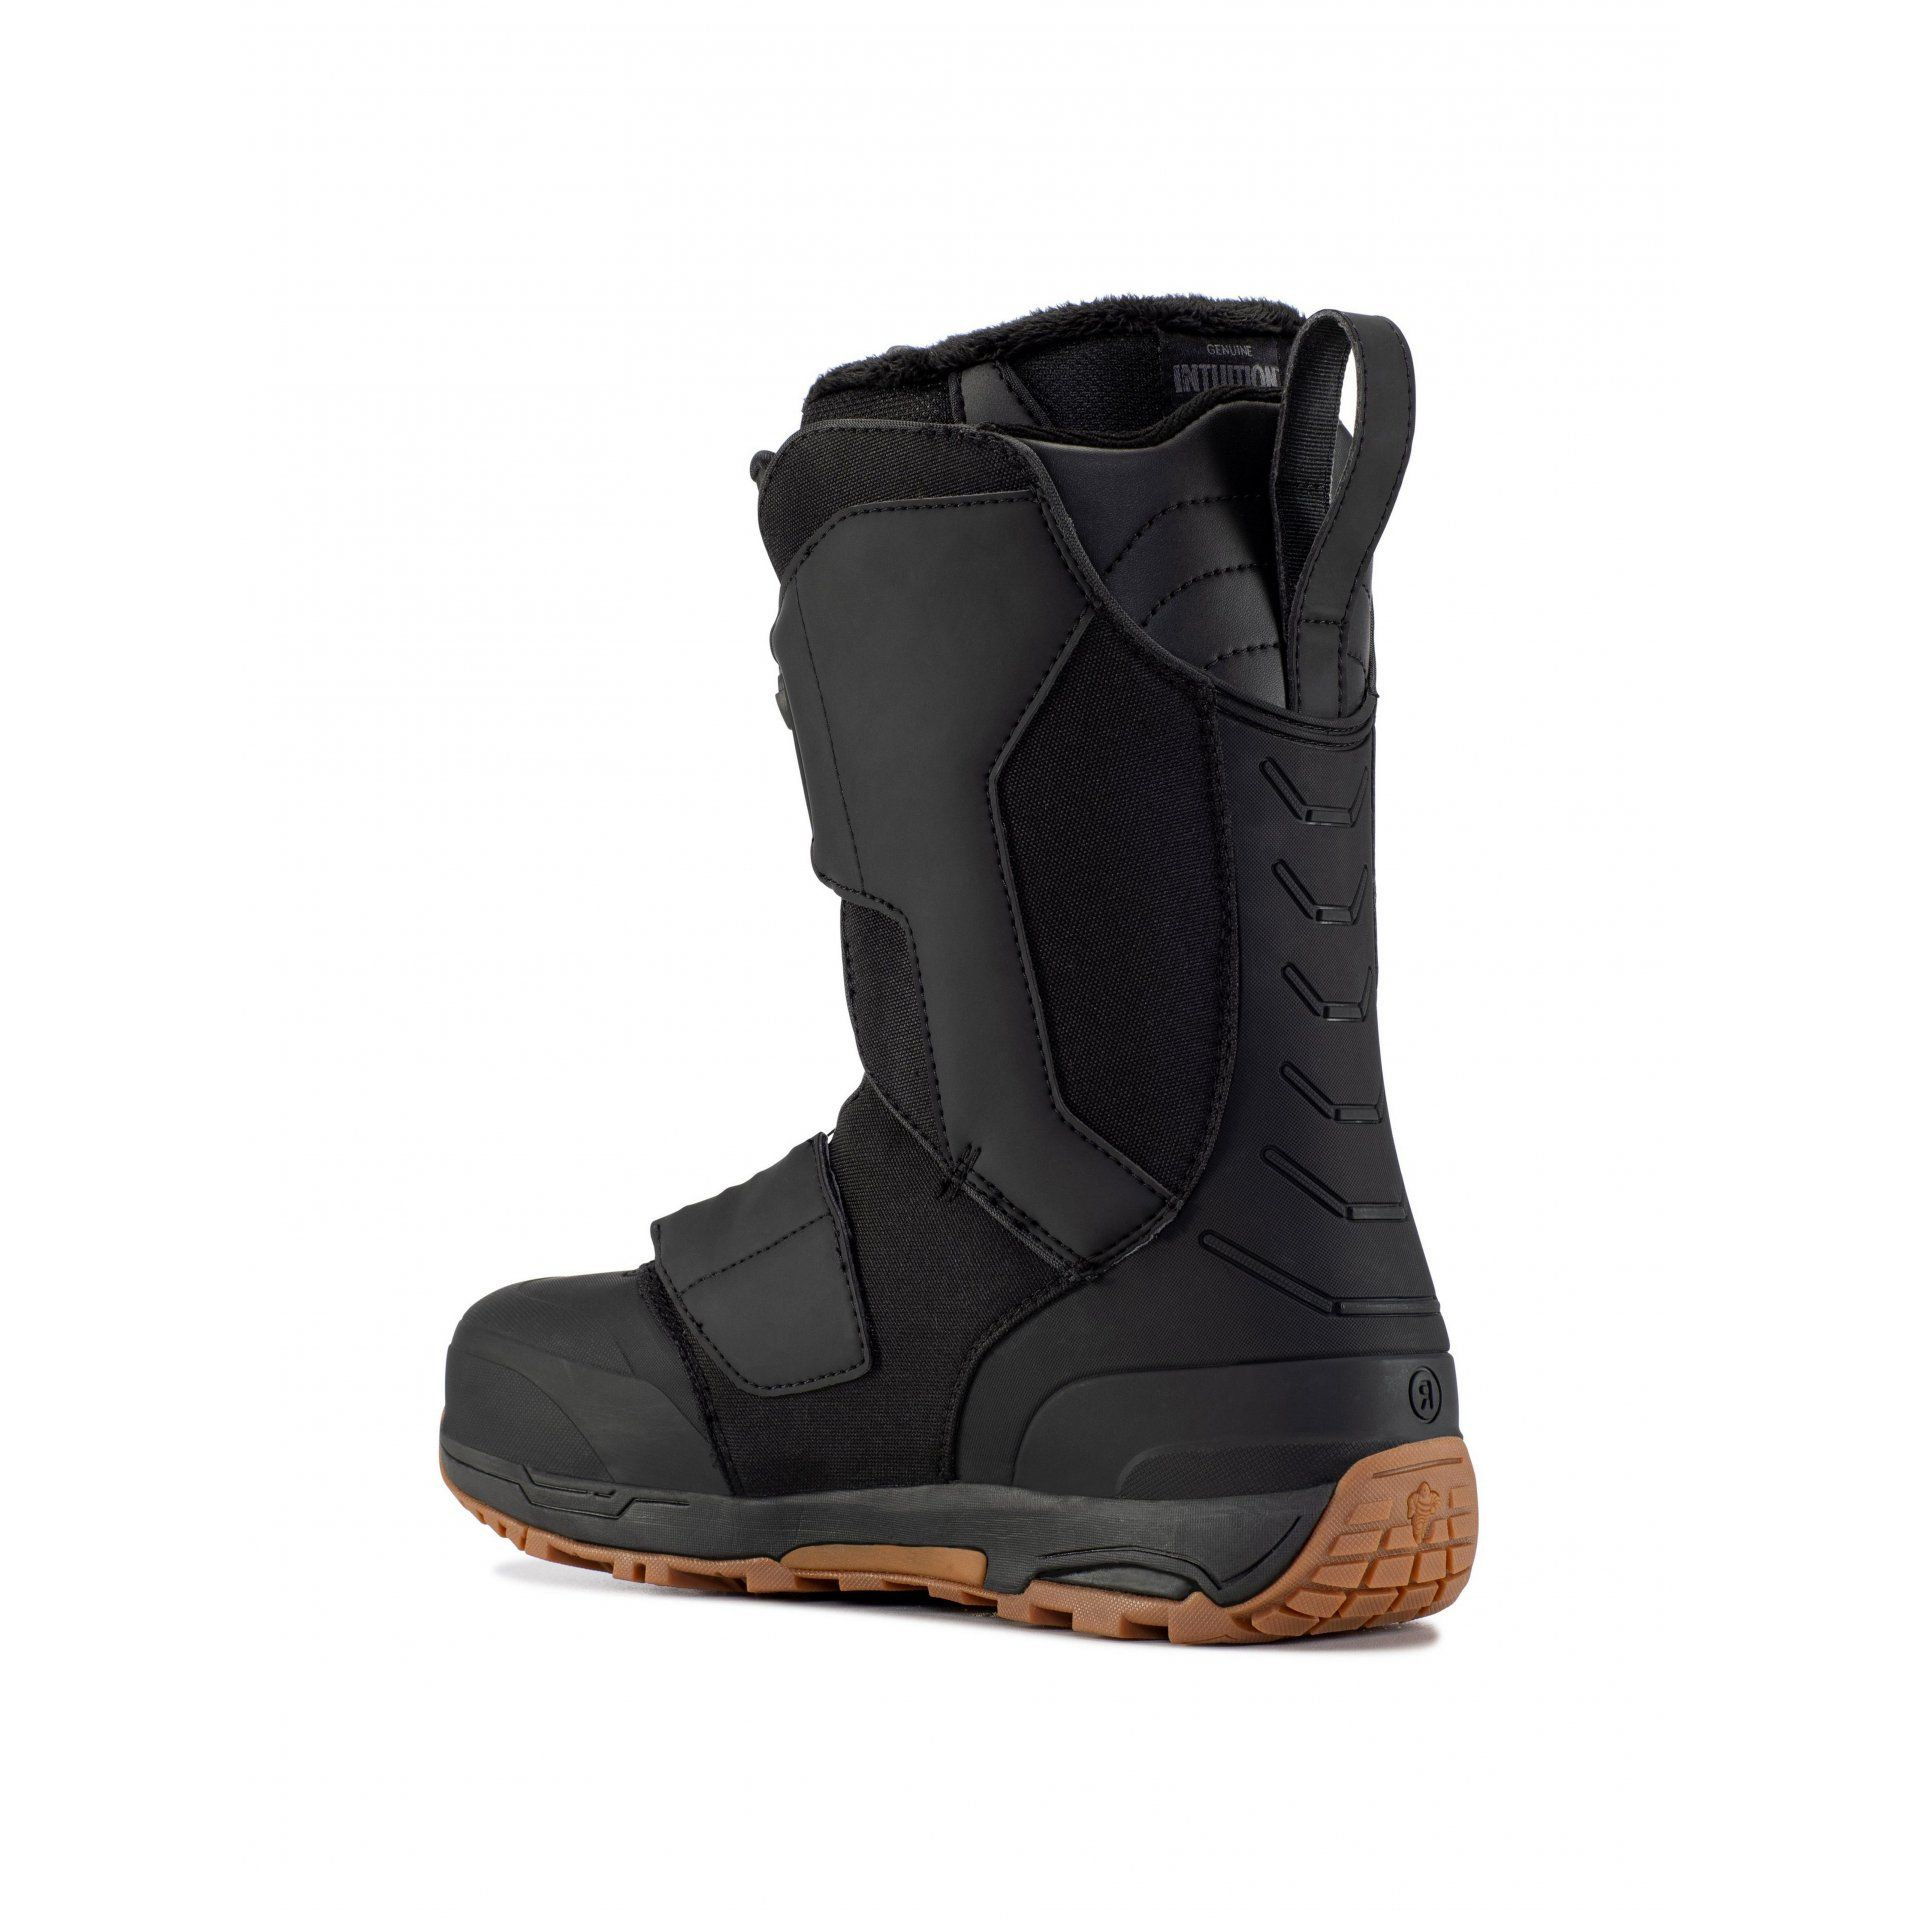 BUTY SNOWBOARDOWE RIDE INSANO 104126 BLACK 3